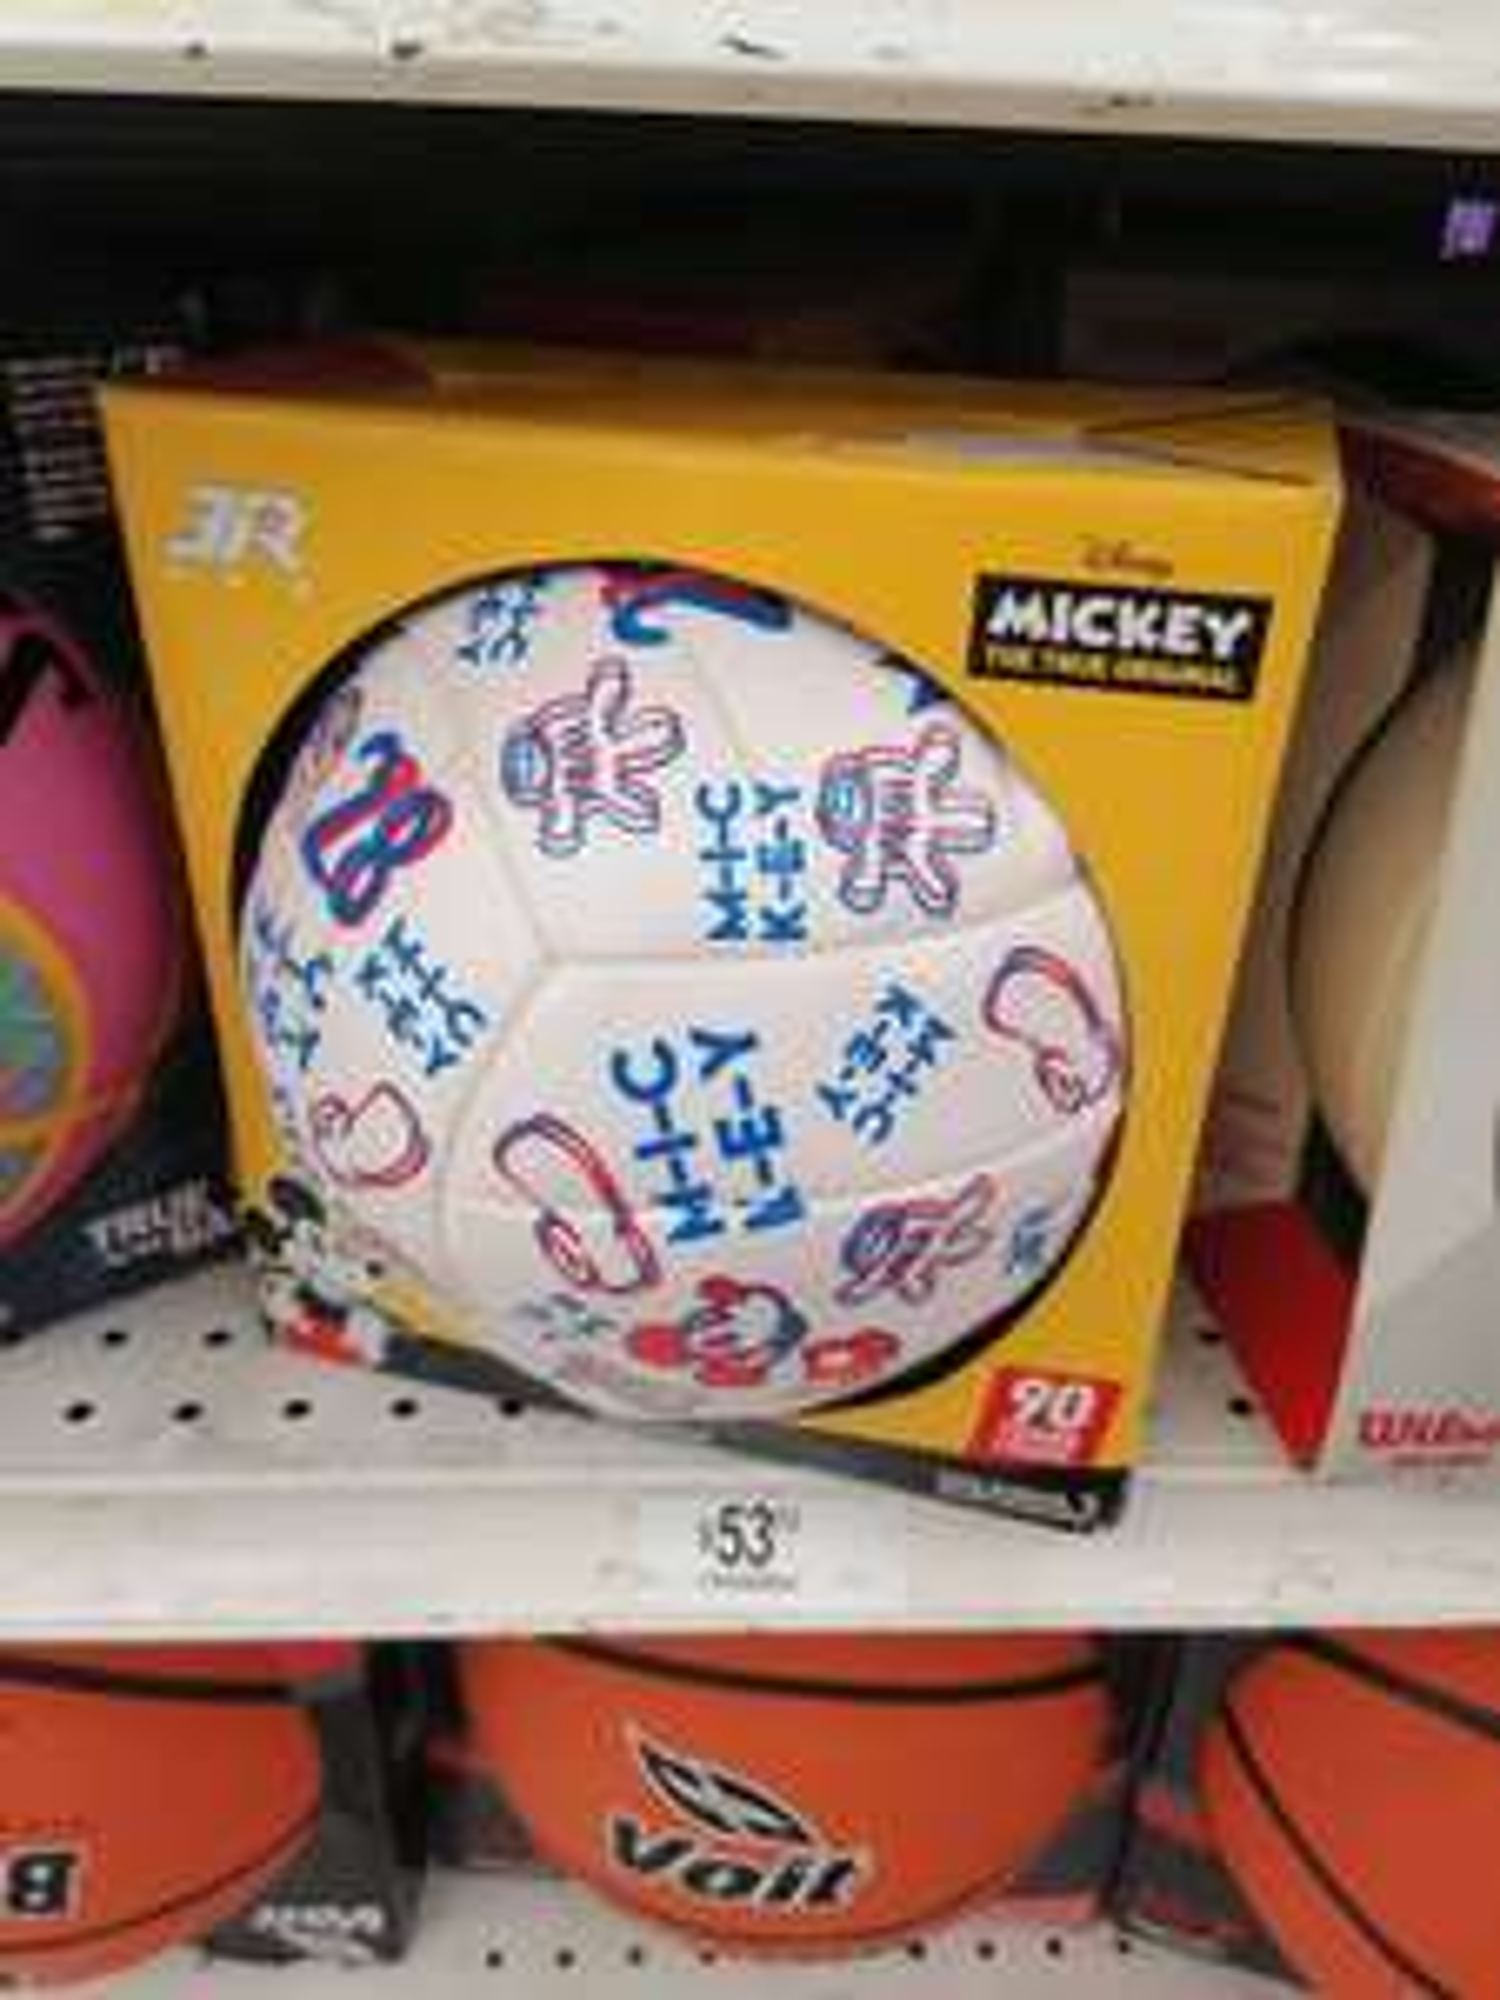 Chedraui Cancun: Balon Volleyball 3R Mickey